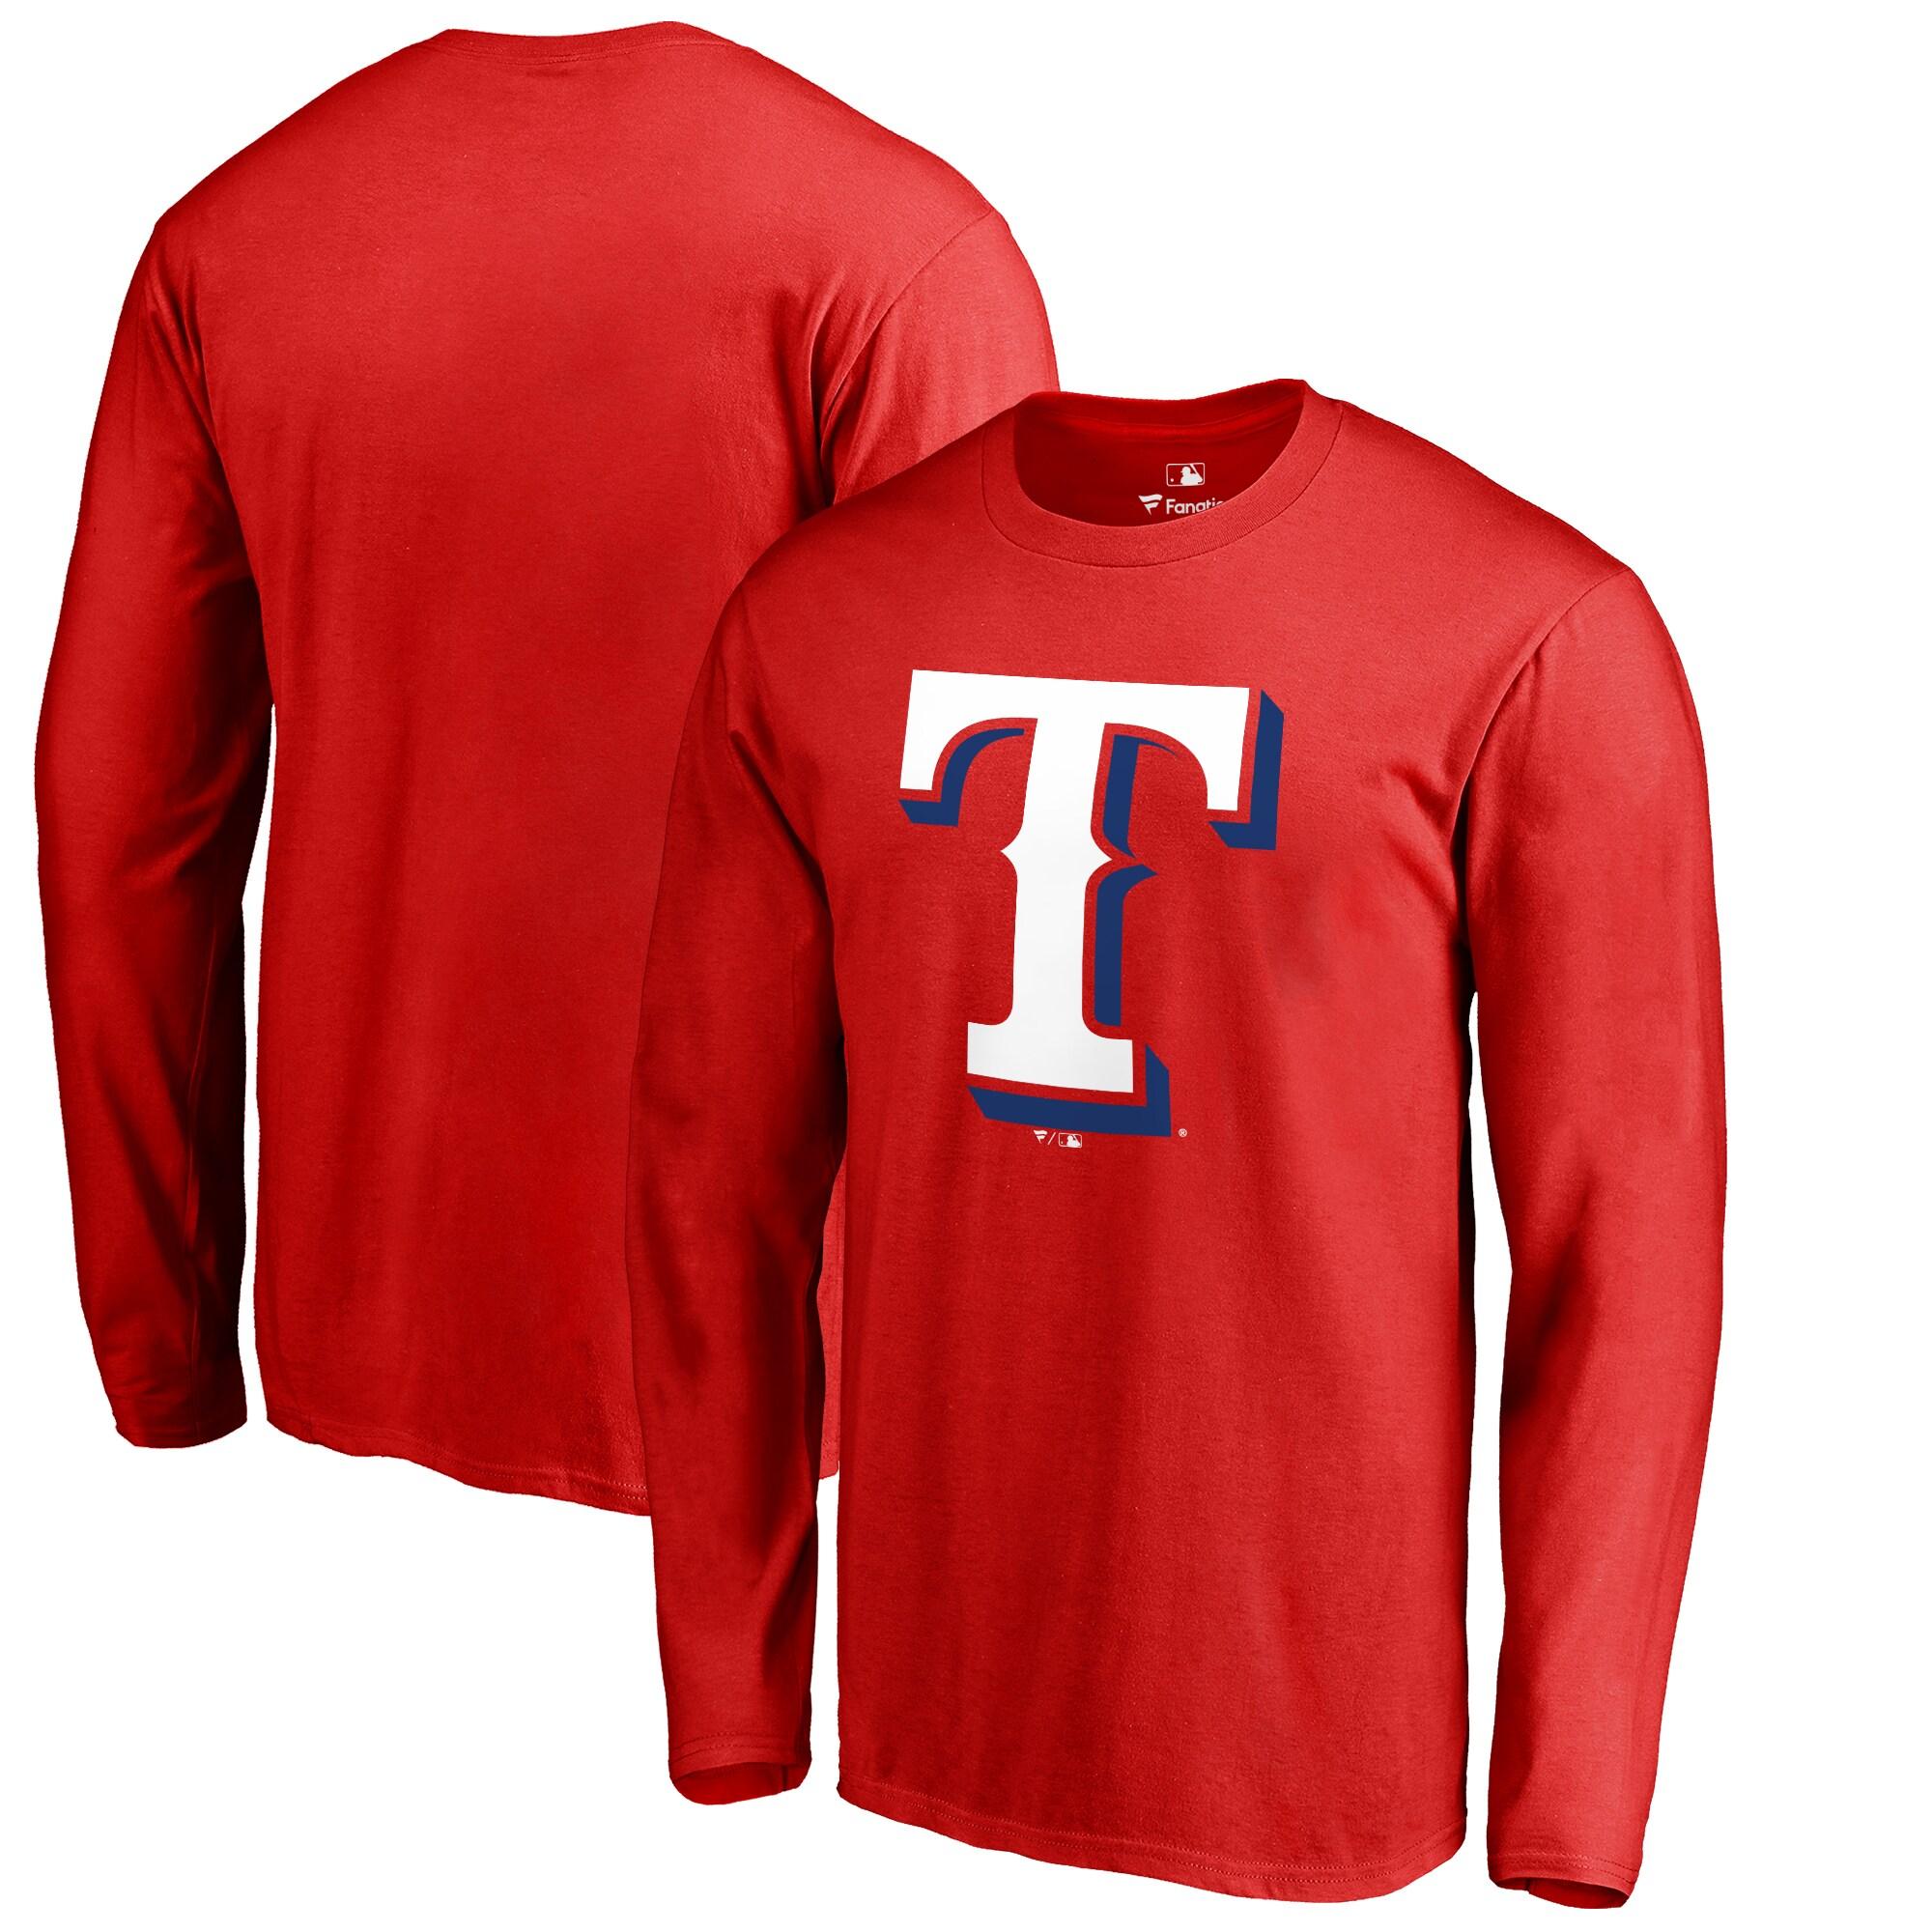 Texas Rangers Big & Tall Primary Team Logo Long Sleeve T-Shirt - Red